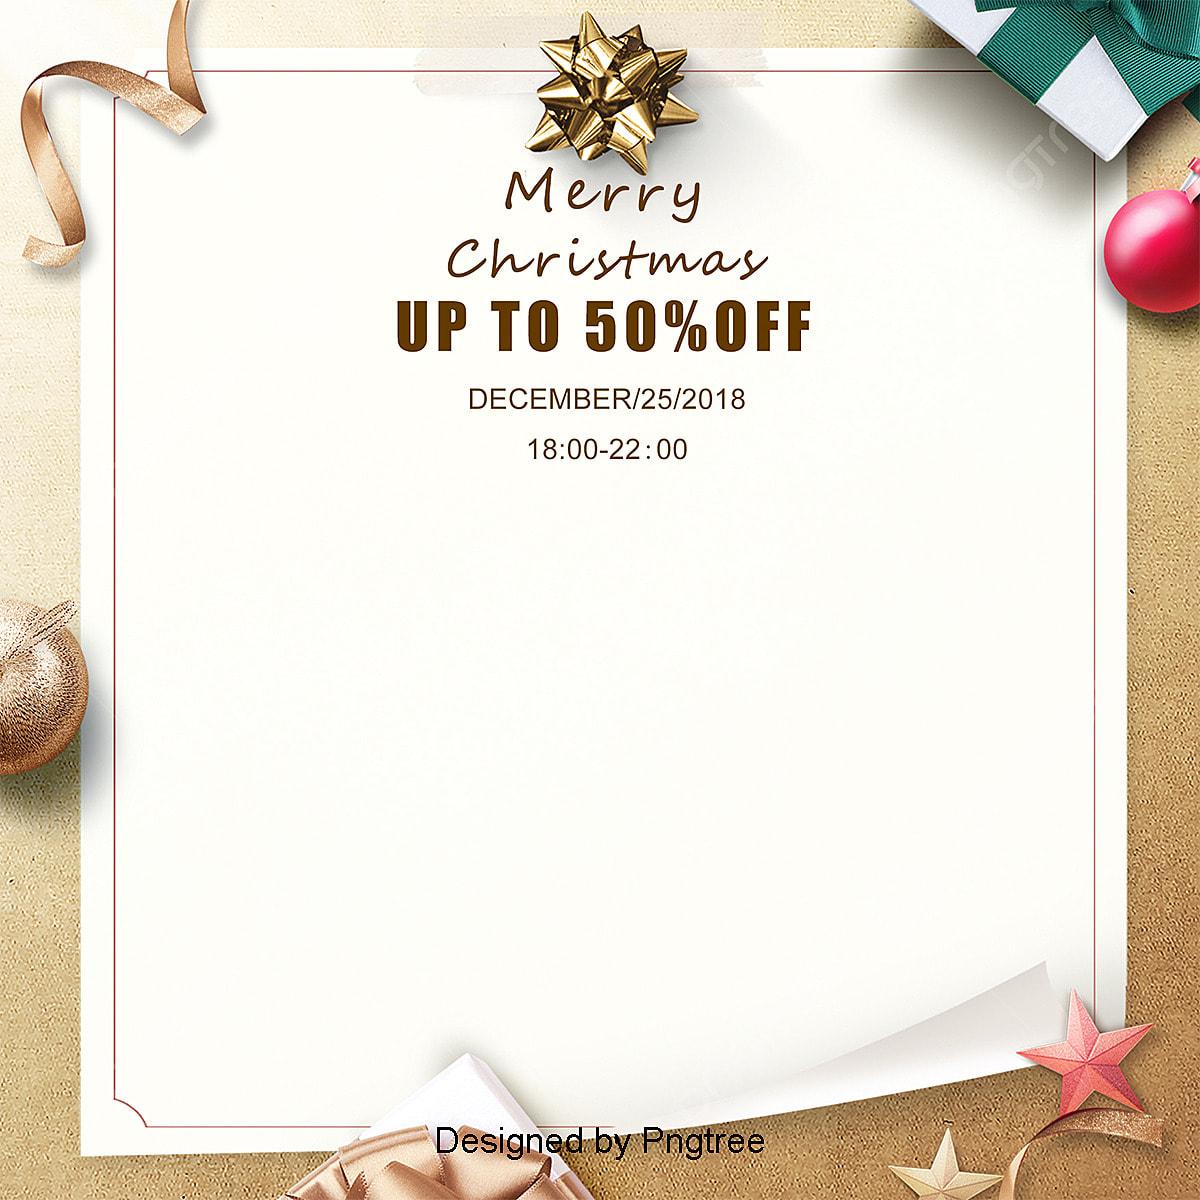 Carta De Invitación Para Navidad Antecedentes Antecedentes